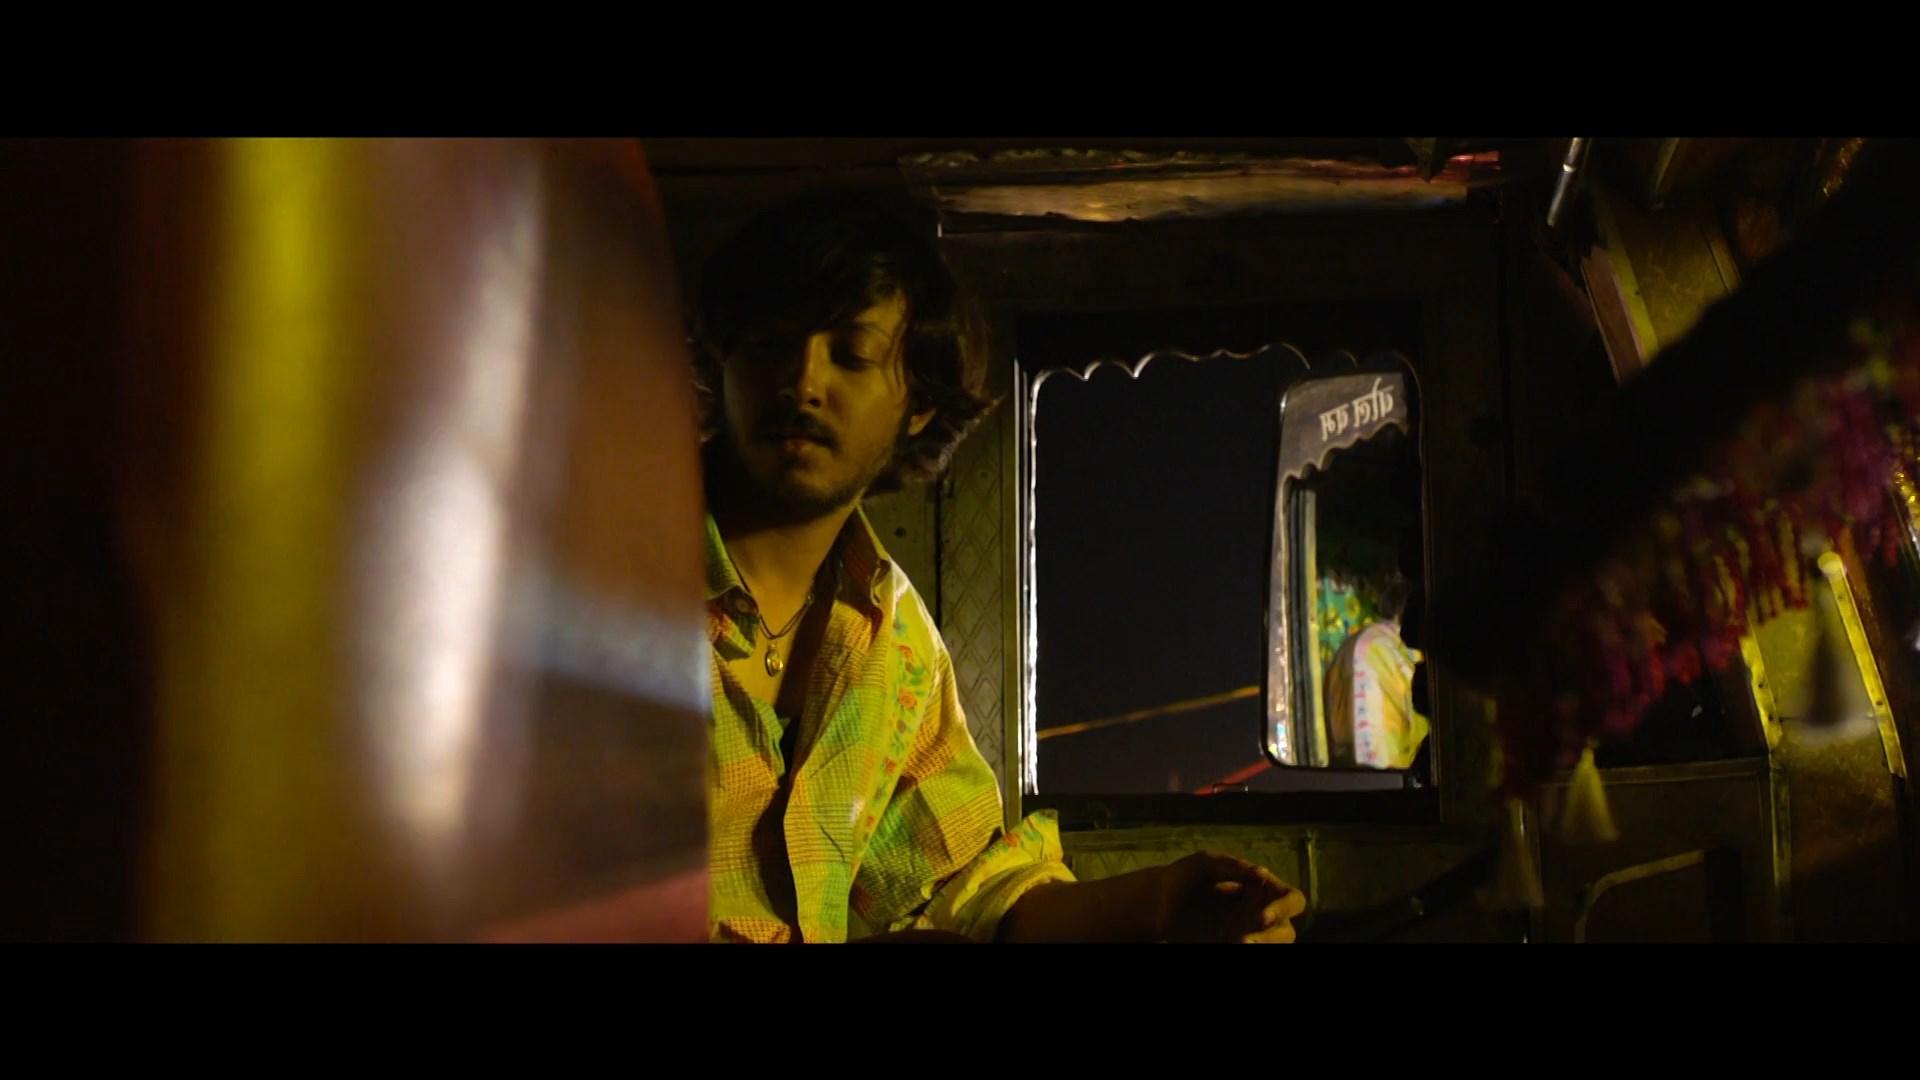 Uronchondi.2018.Bengali.1080p.WEB.DL.AVC.AAC.DUS.ICTV.mkv snapshot 00.21.46.000